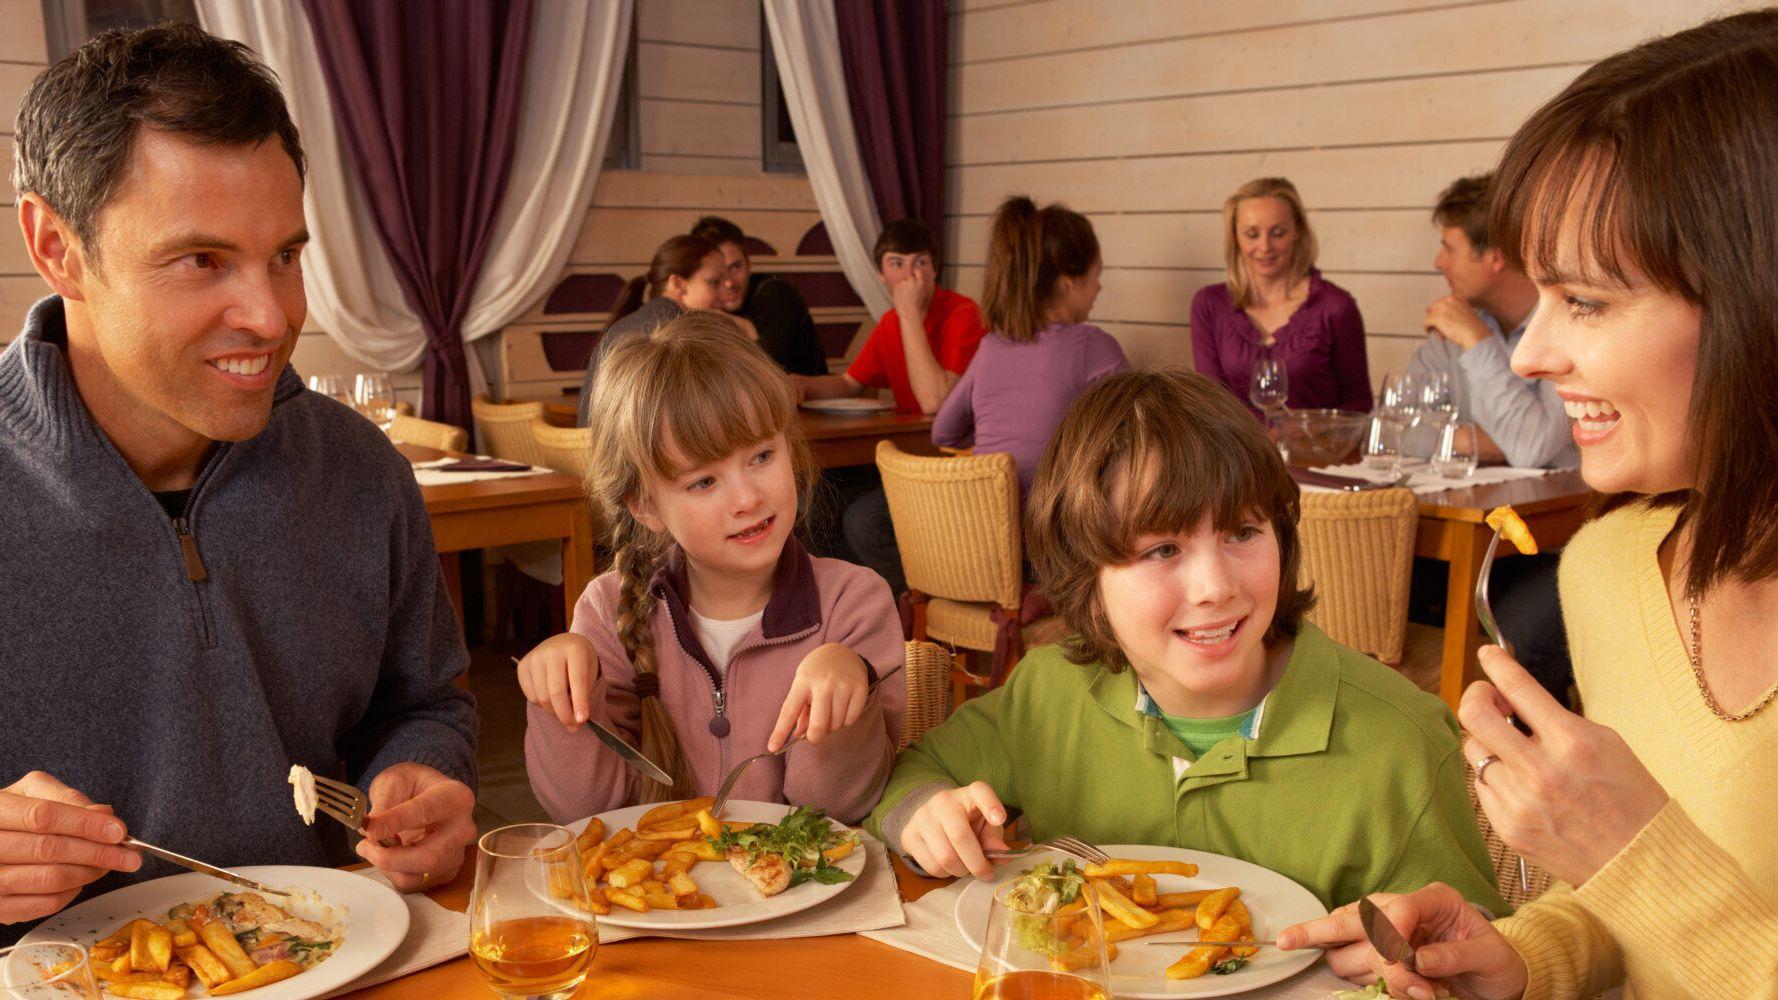 Occupy Children In Restaurants Without